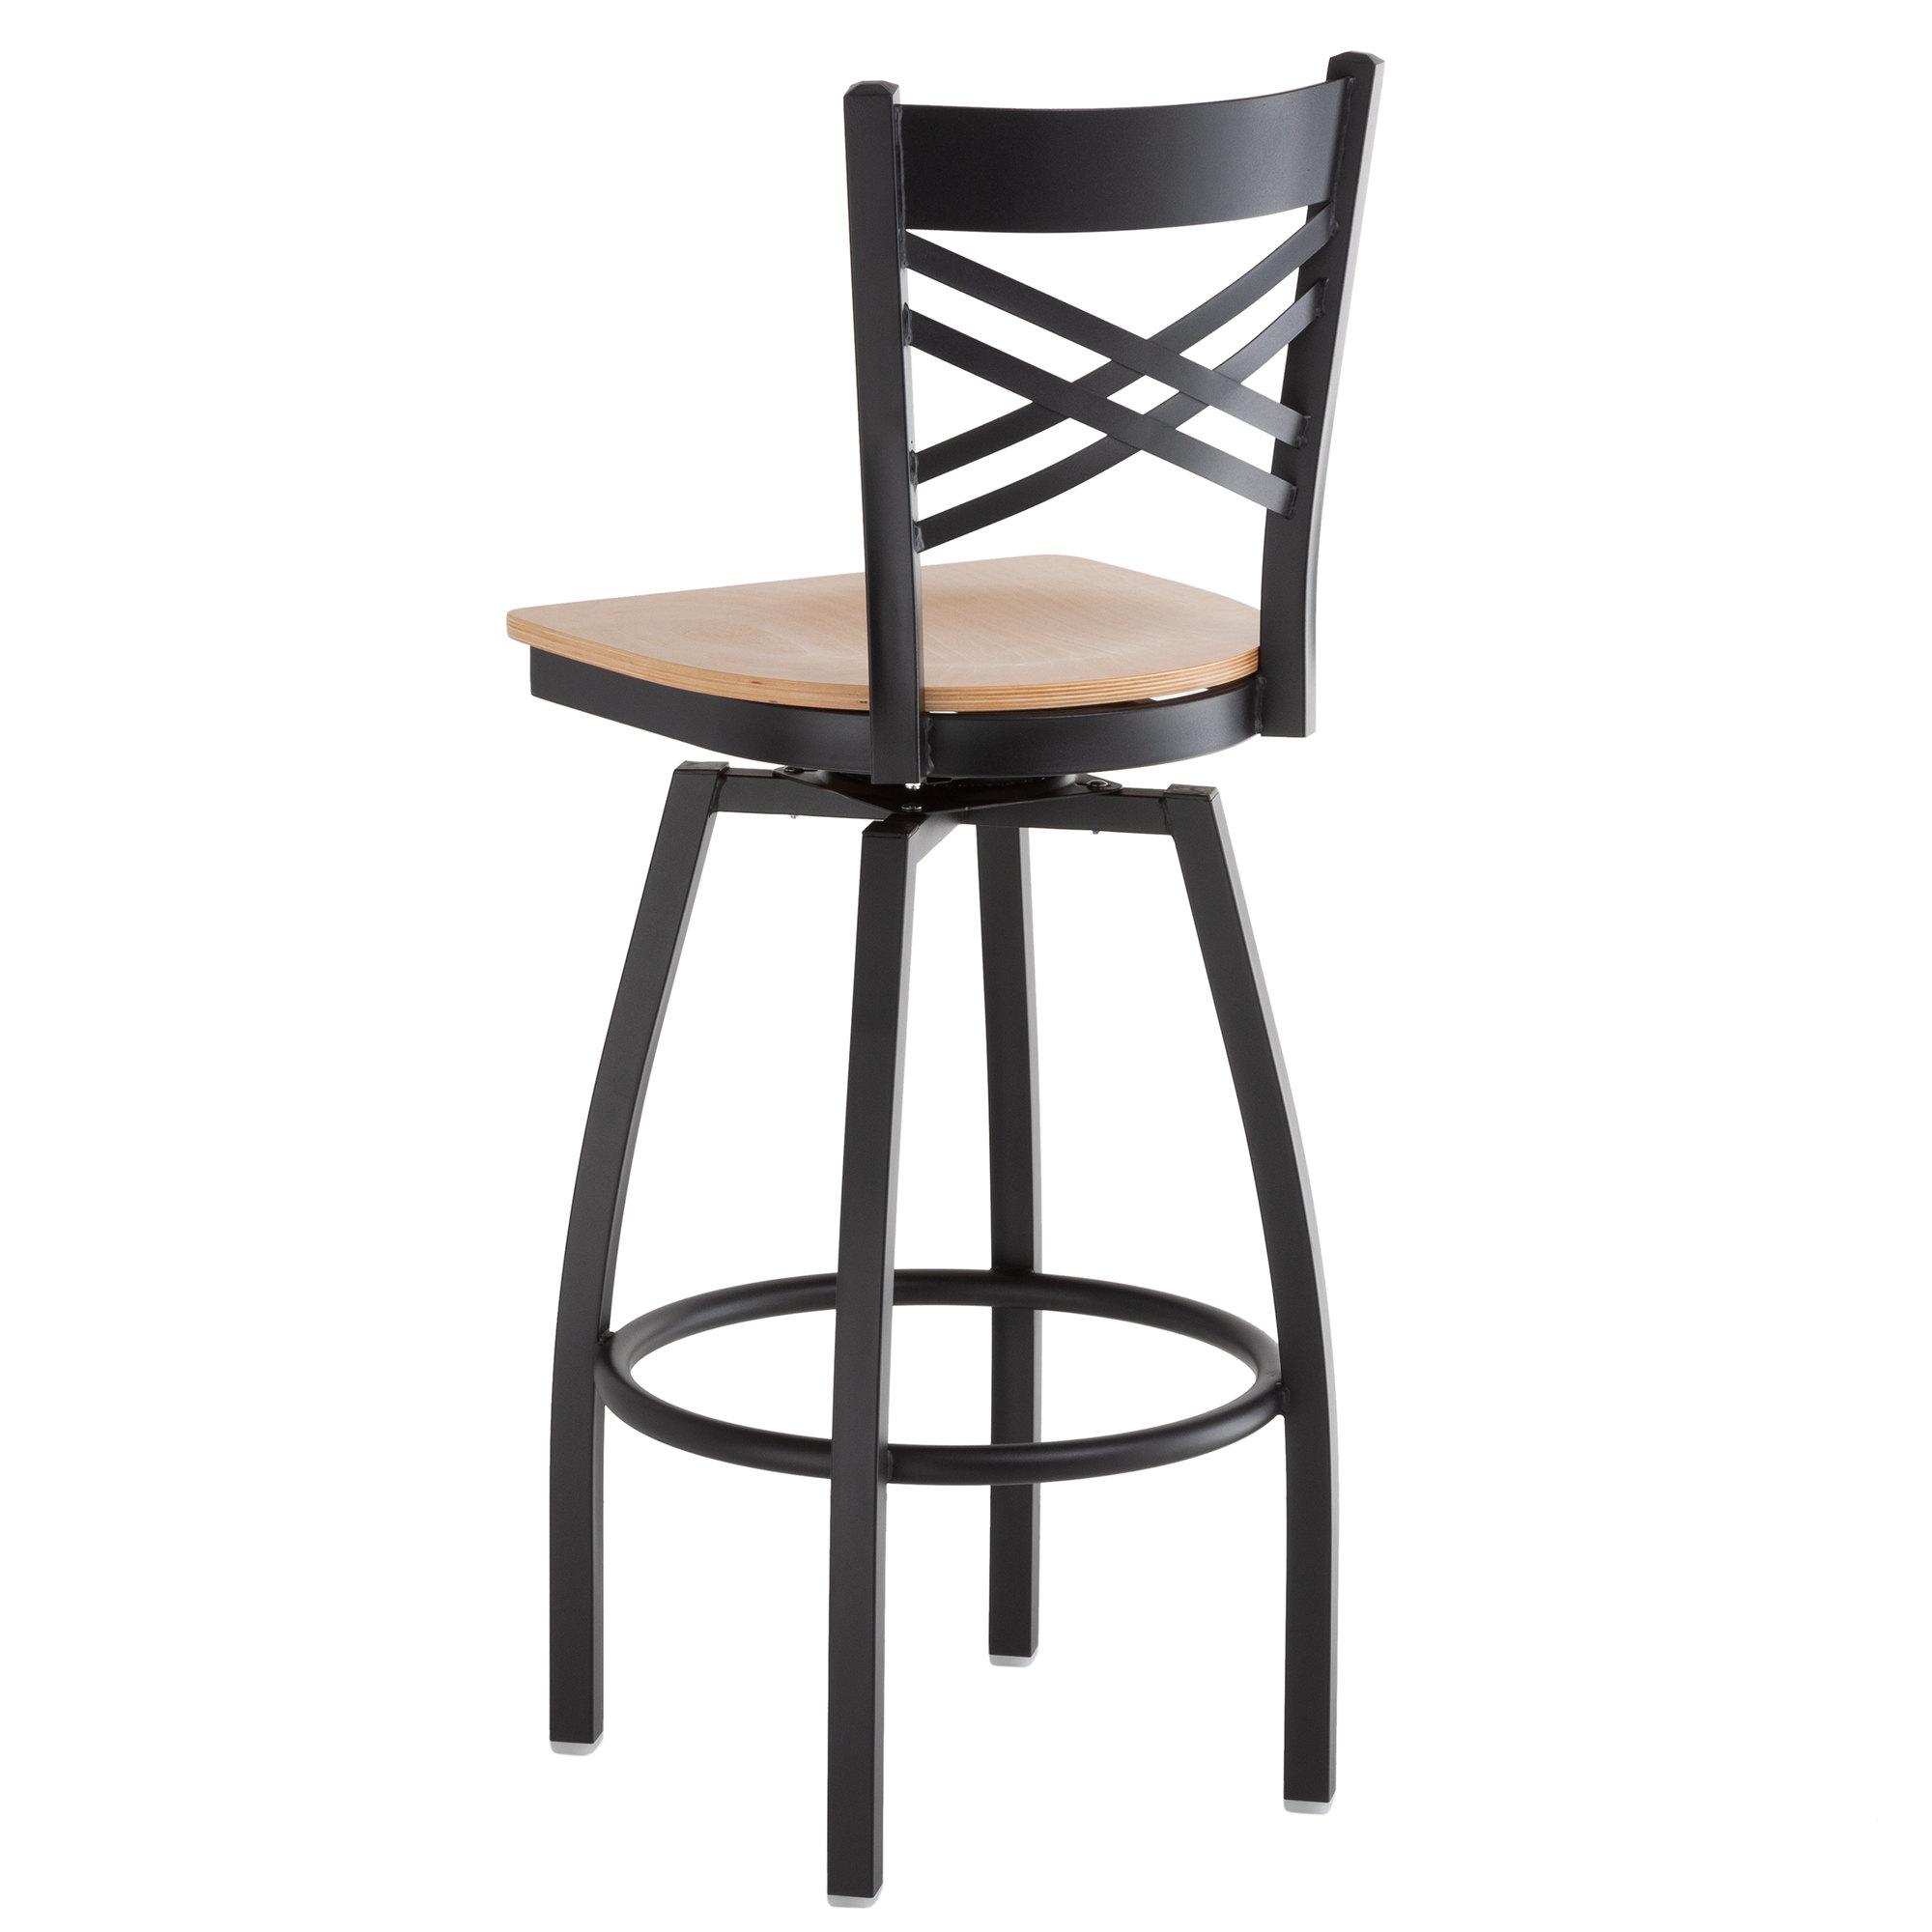 #172 - Cross Back Design Swivel Restaurant Barstool with Natural Wood Seat